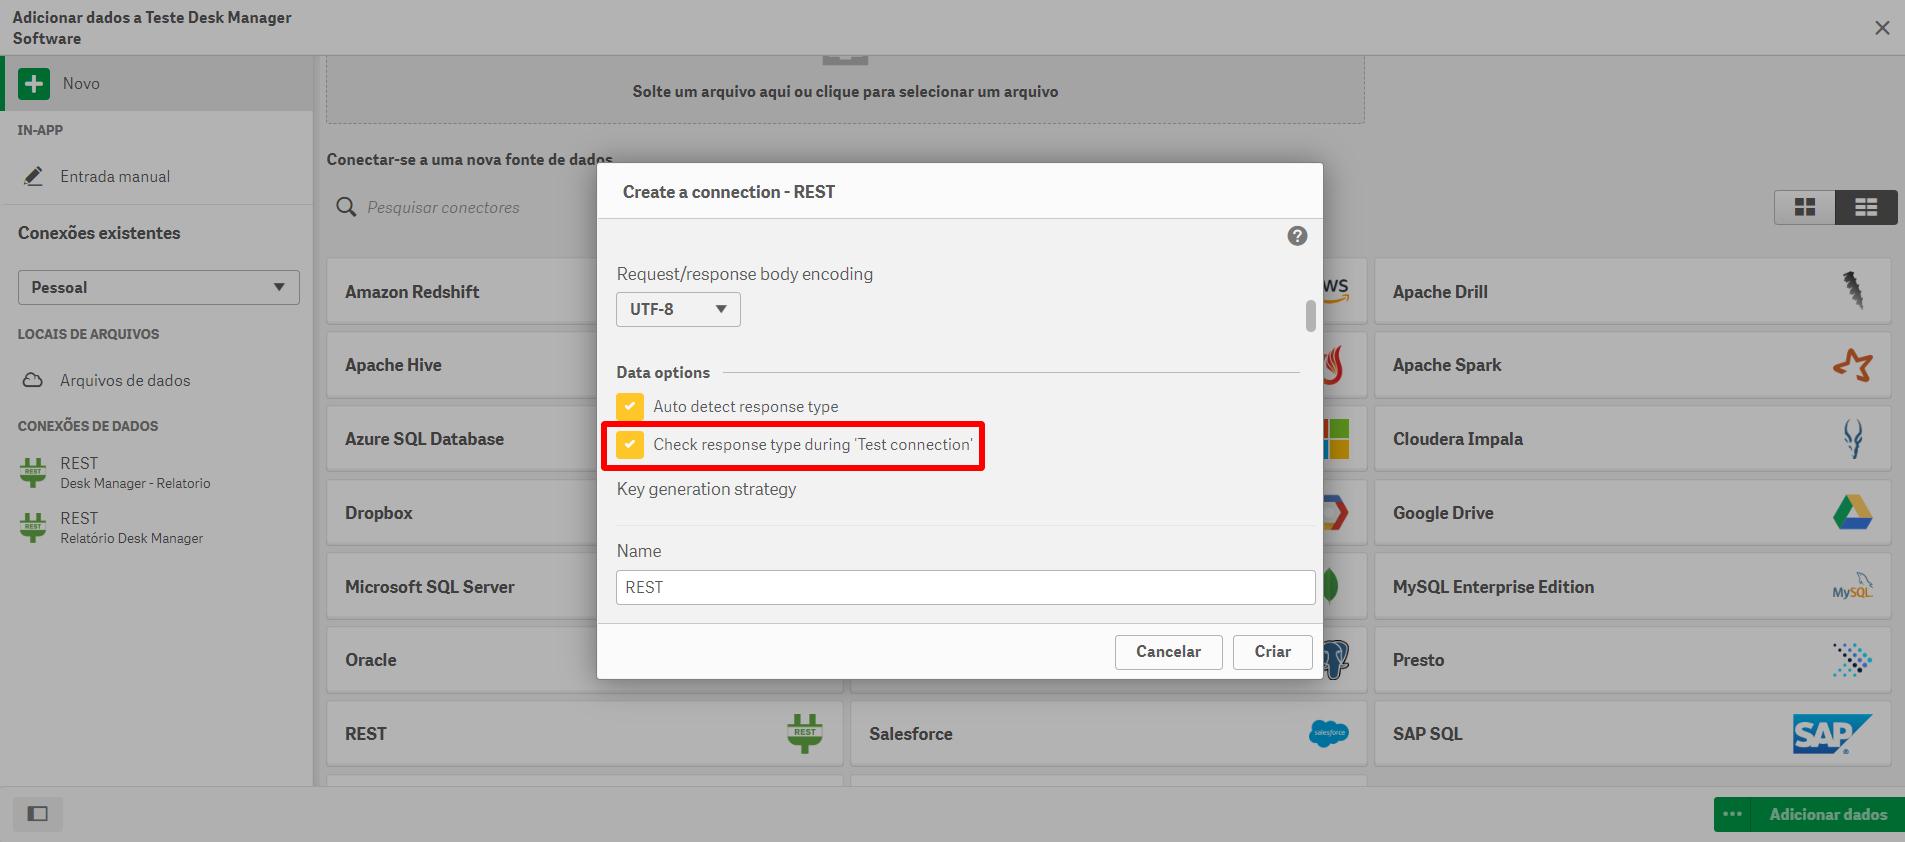 Desmarcar a opção Check Response Type During Test Connection   Qlik Sense e Desk Manager